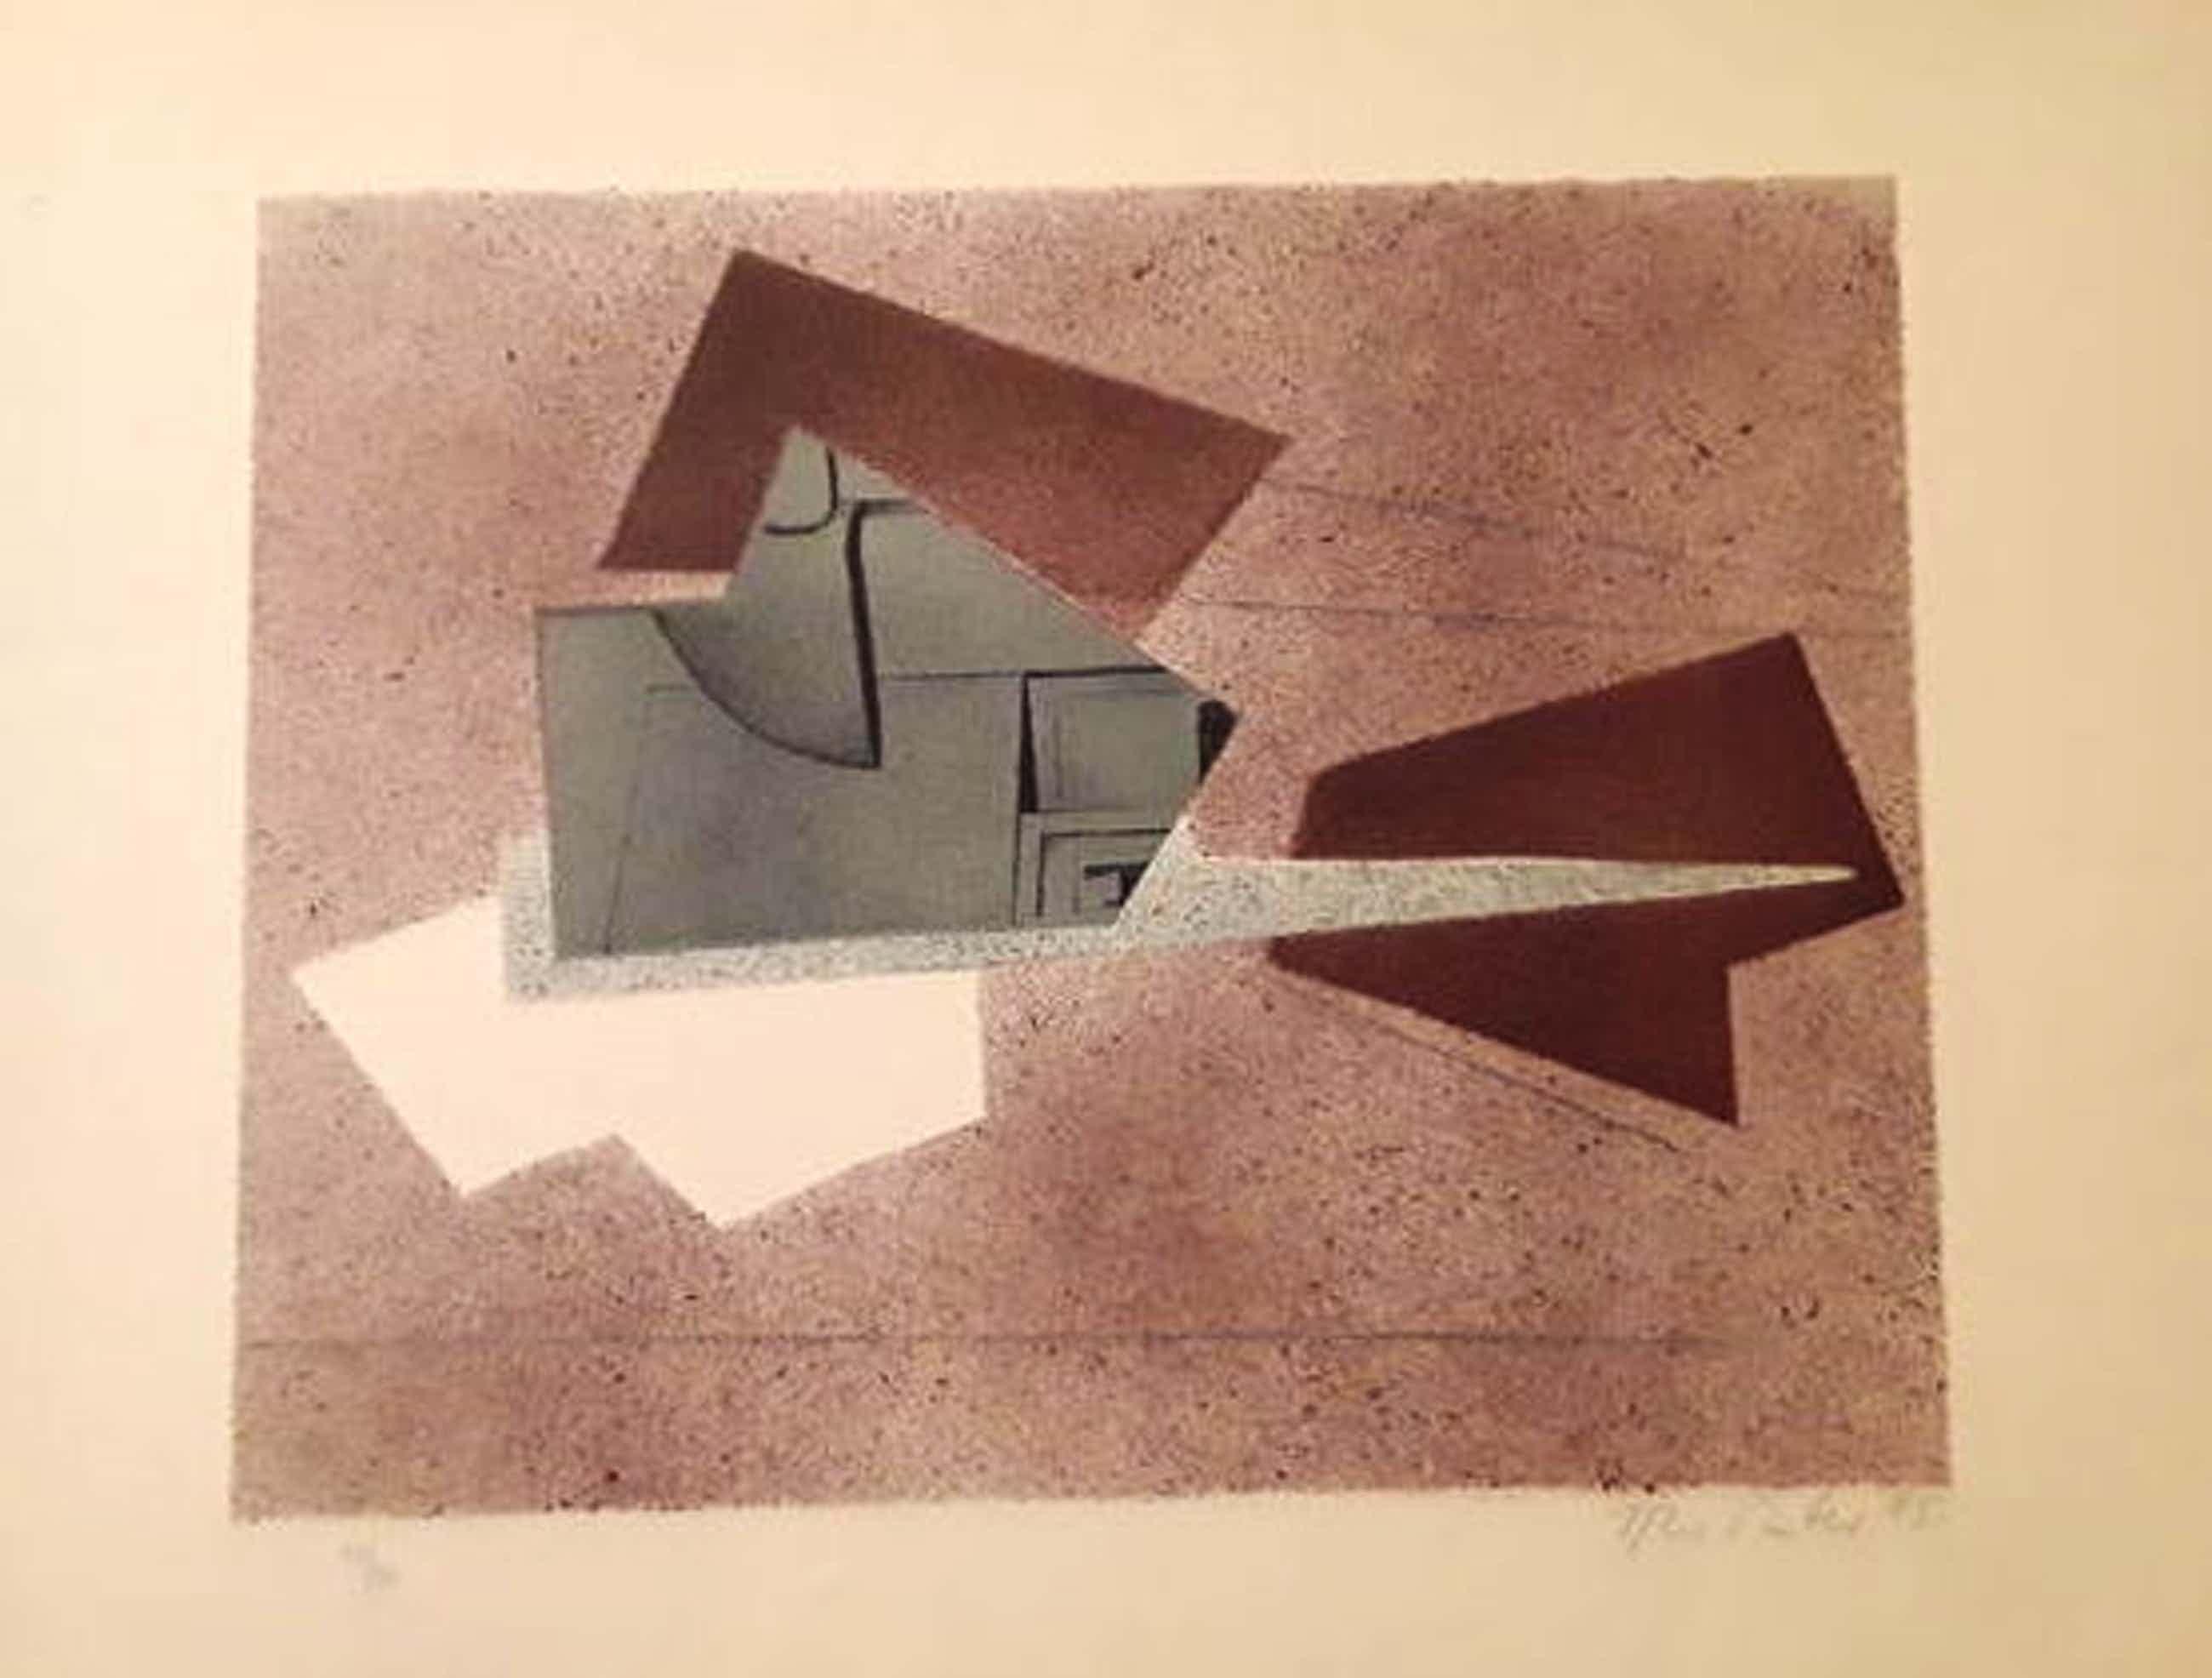 Hans Richter - Composition 1975 - Lithografie 50/90 kopen? Bied vanaf 420!